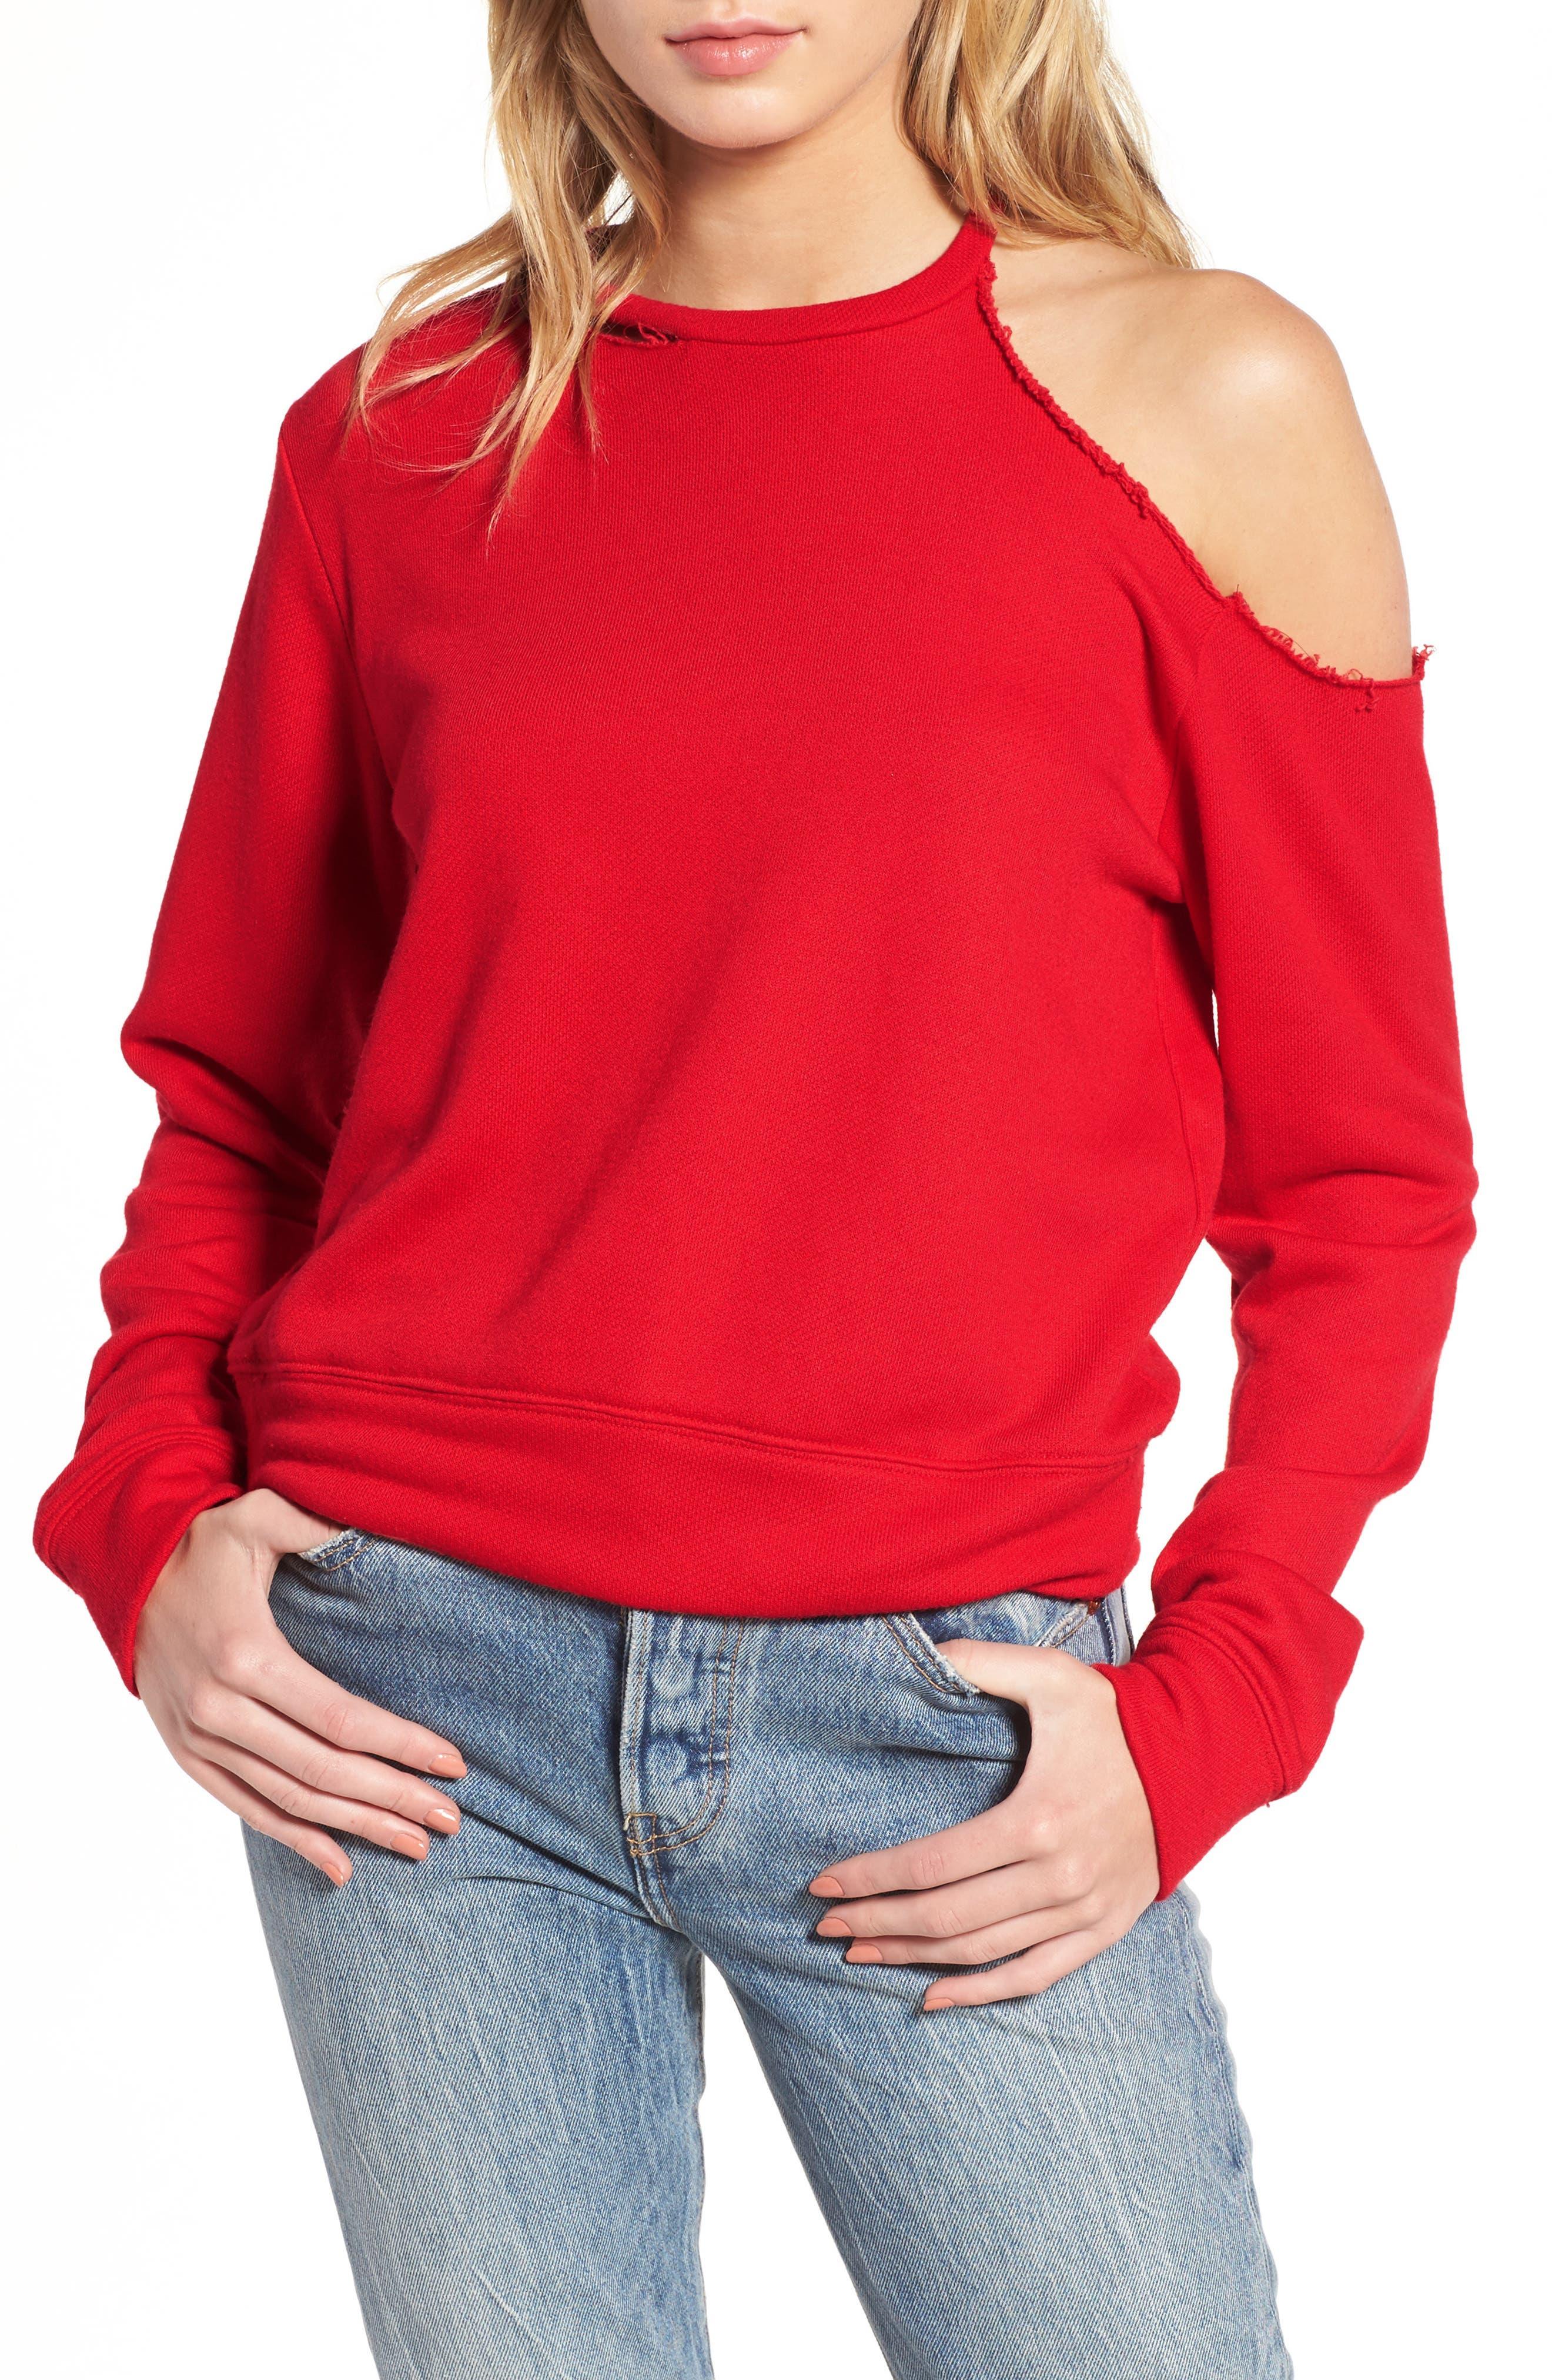 Mikko Distressed Cold Shoulder Sweatshirt,                         Main,                         color, Red